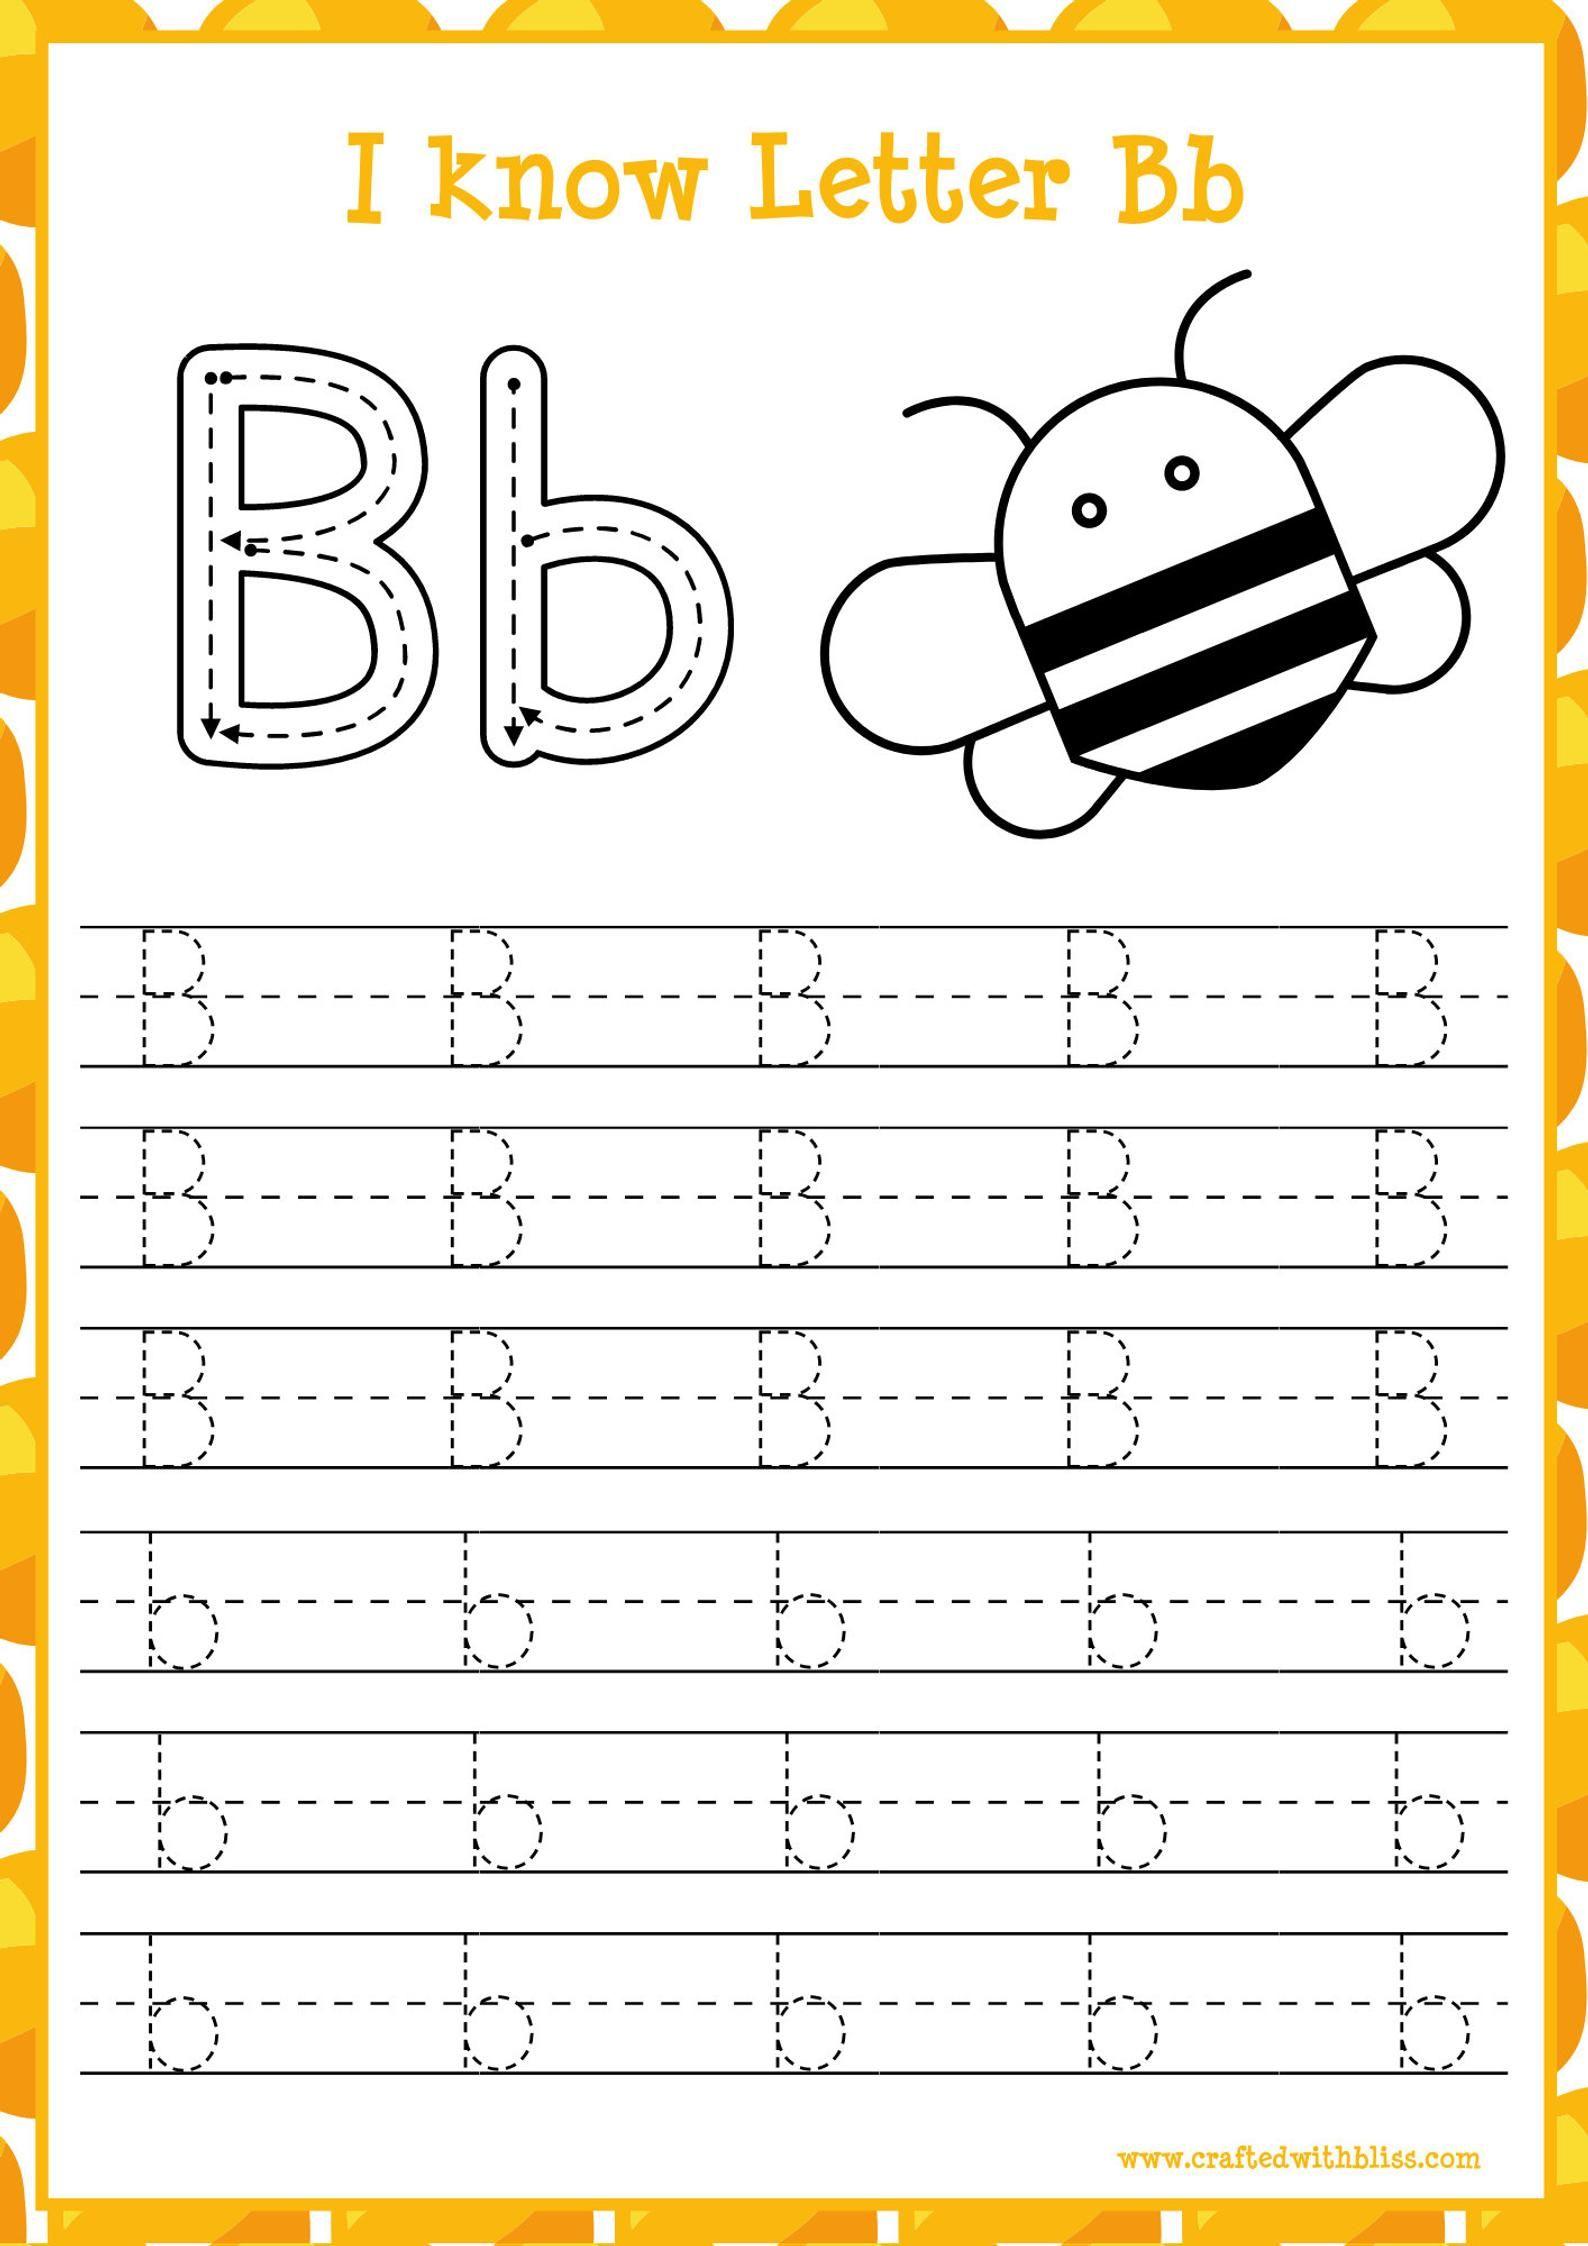 Bee Themed Alphabet Tracing Worksheet Alphabet Tracing Worksheets For 3 Year Olds Alphabet Tracing Worksheet Writing A Z Tracing Abc In 2021 Alphabet Tracing Worksheets Tracing Worksheets Alphabet Tracing [ 2246 x 1588 Pixel ]